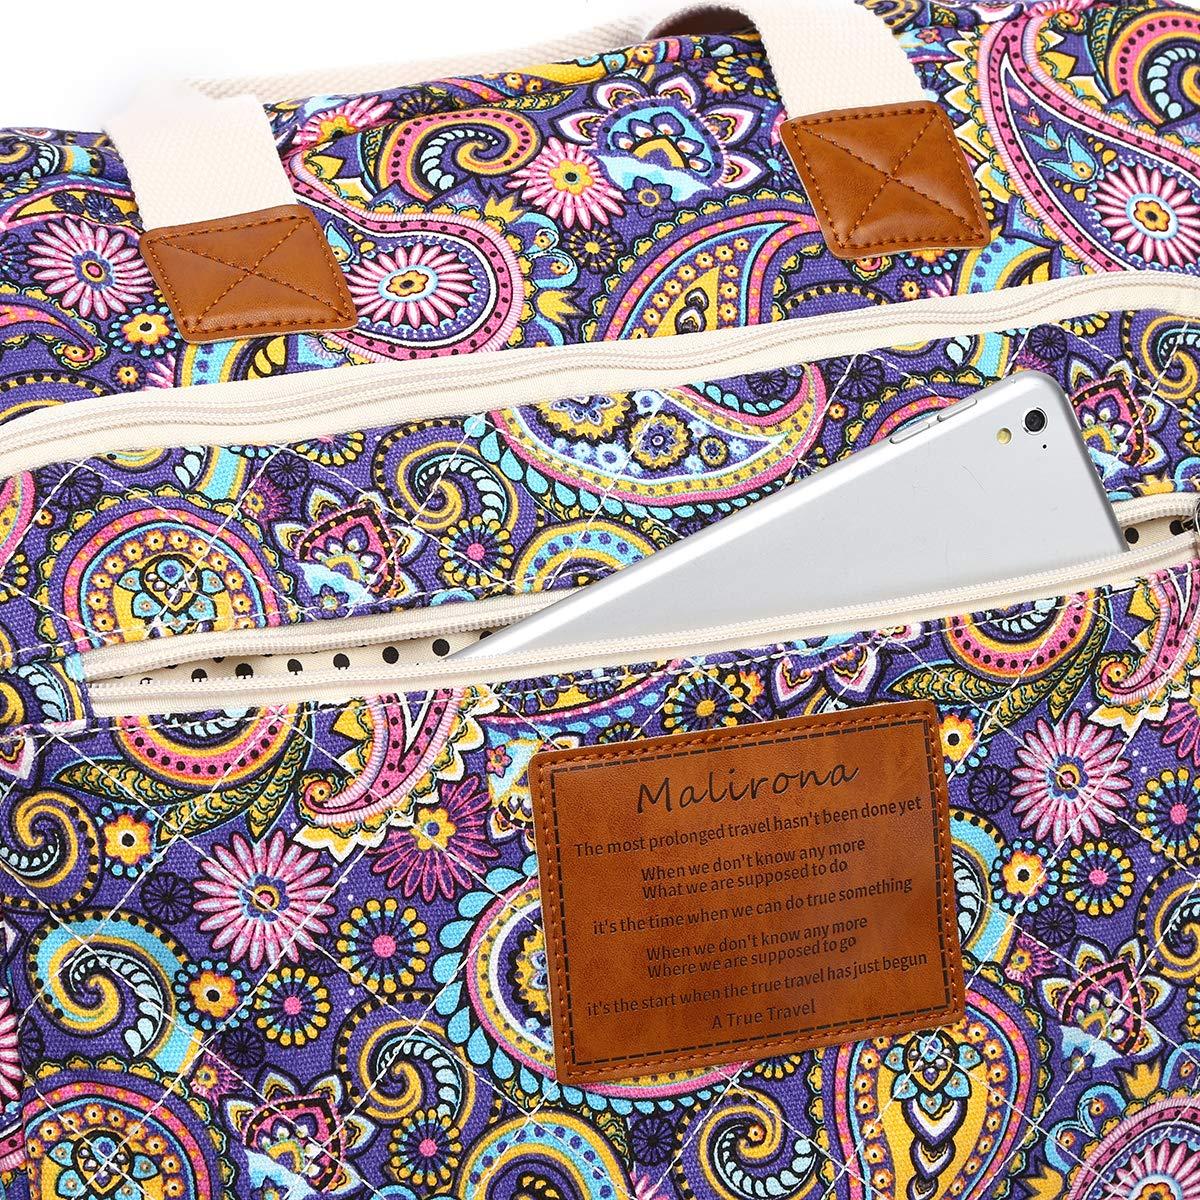 Malirona Women's Canvas Overnight Weekender Bag Carry On Travel Duffel Tote Bag Bohemian Flower (Purple Flower) by Malirona (Image #6)